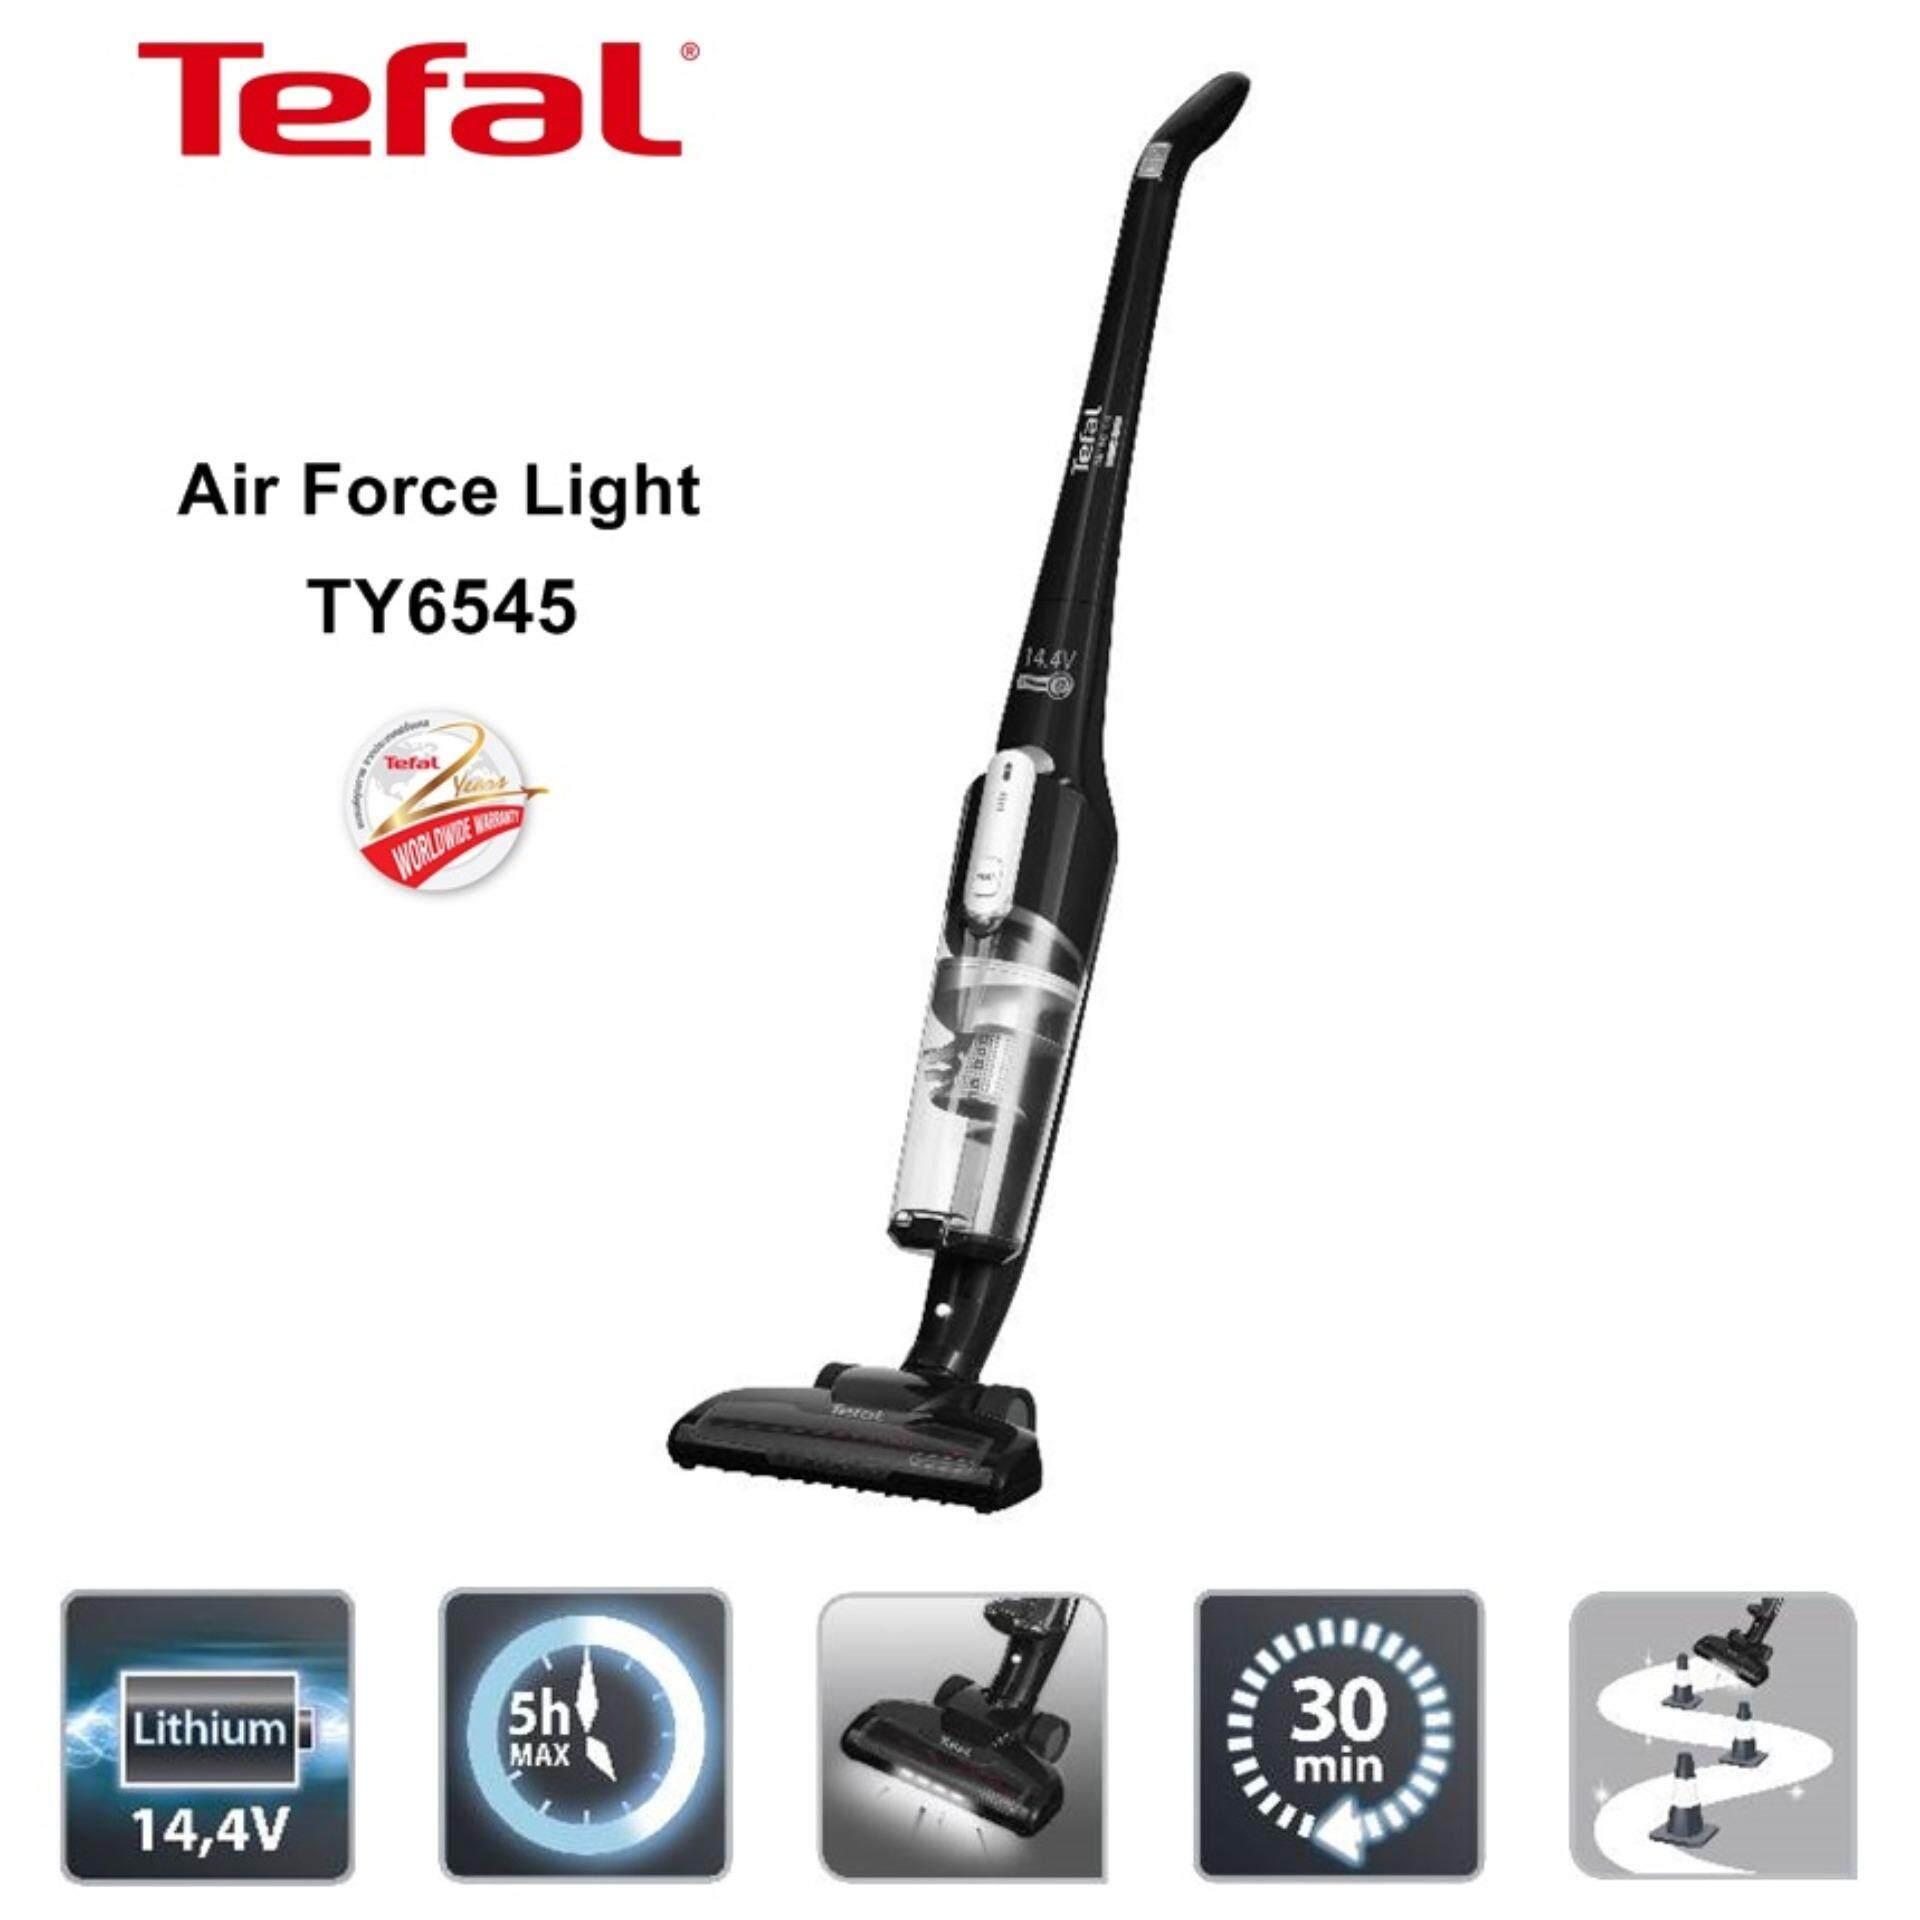 TEFAL เครื่องดูดฝุ่นไร้สาย14.4V  รุ่น TY6545